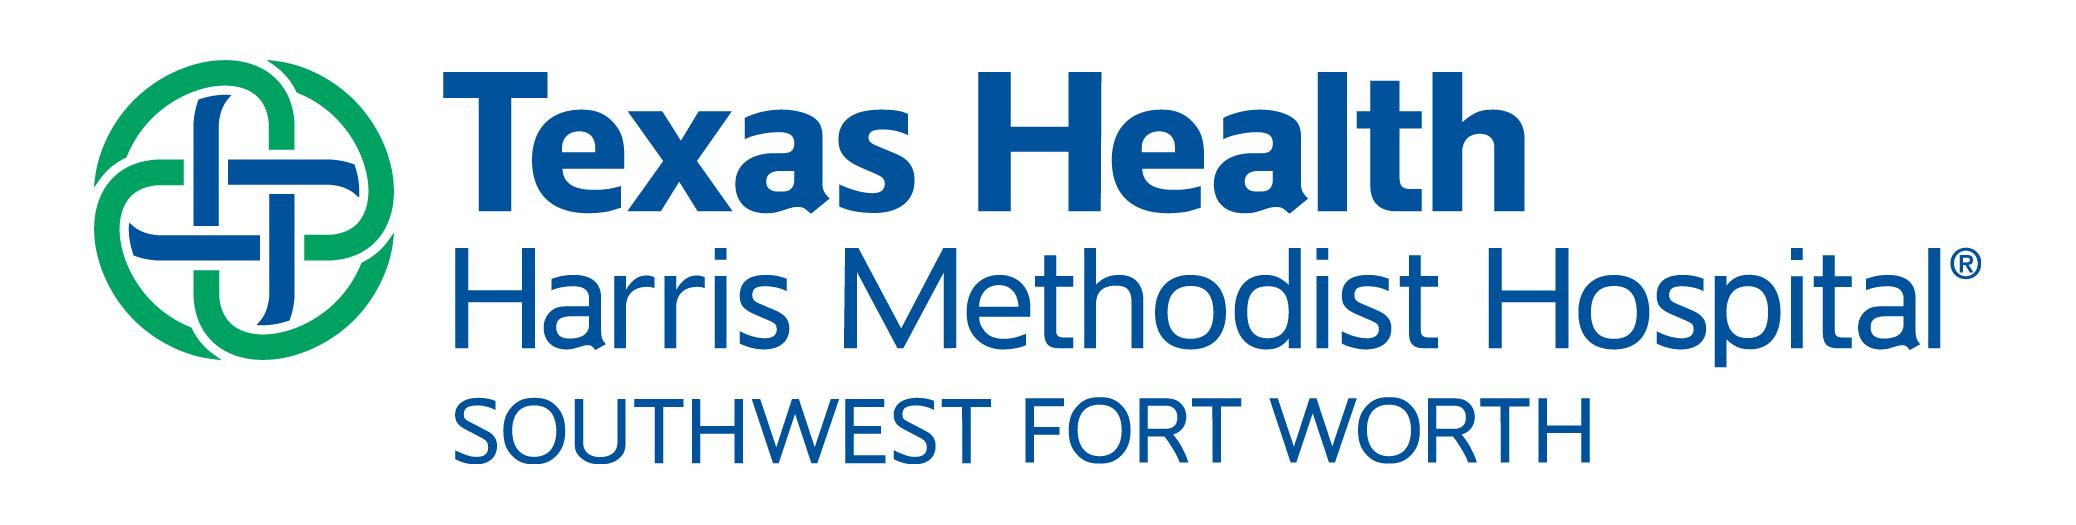 Texas Health Harris Methodist Hospital Southwest Fort Worth